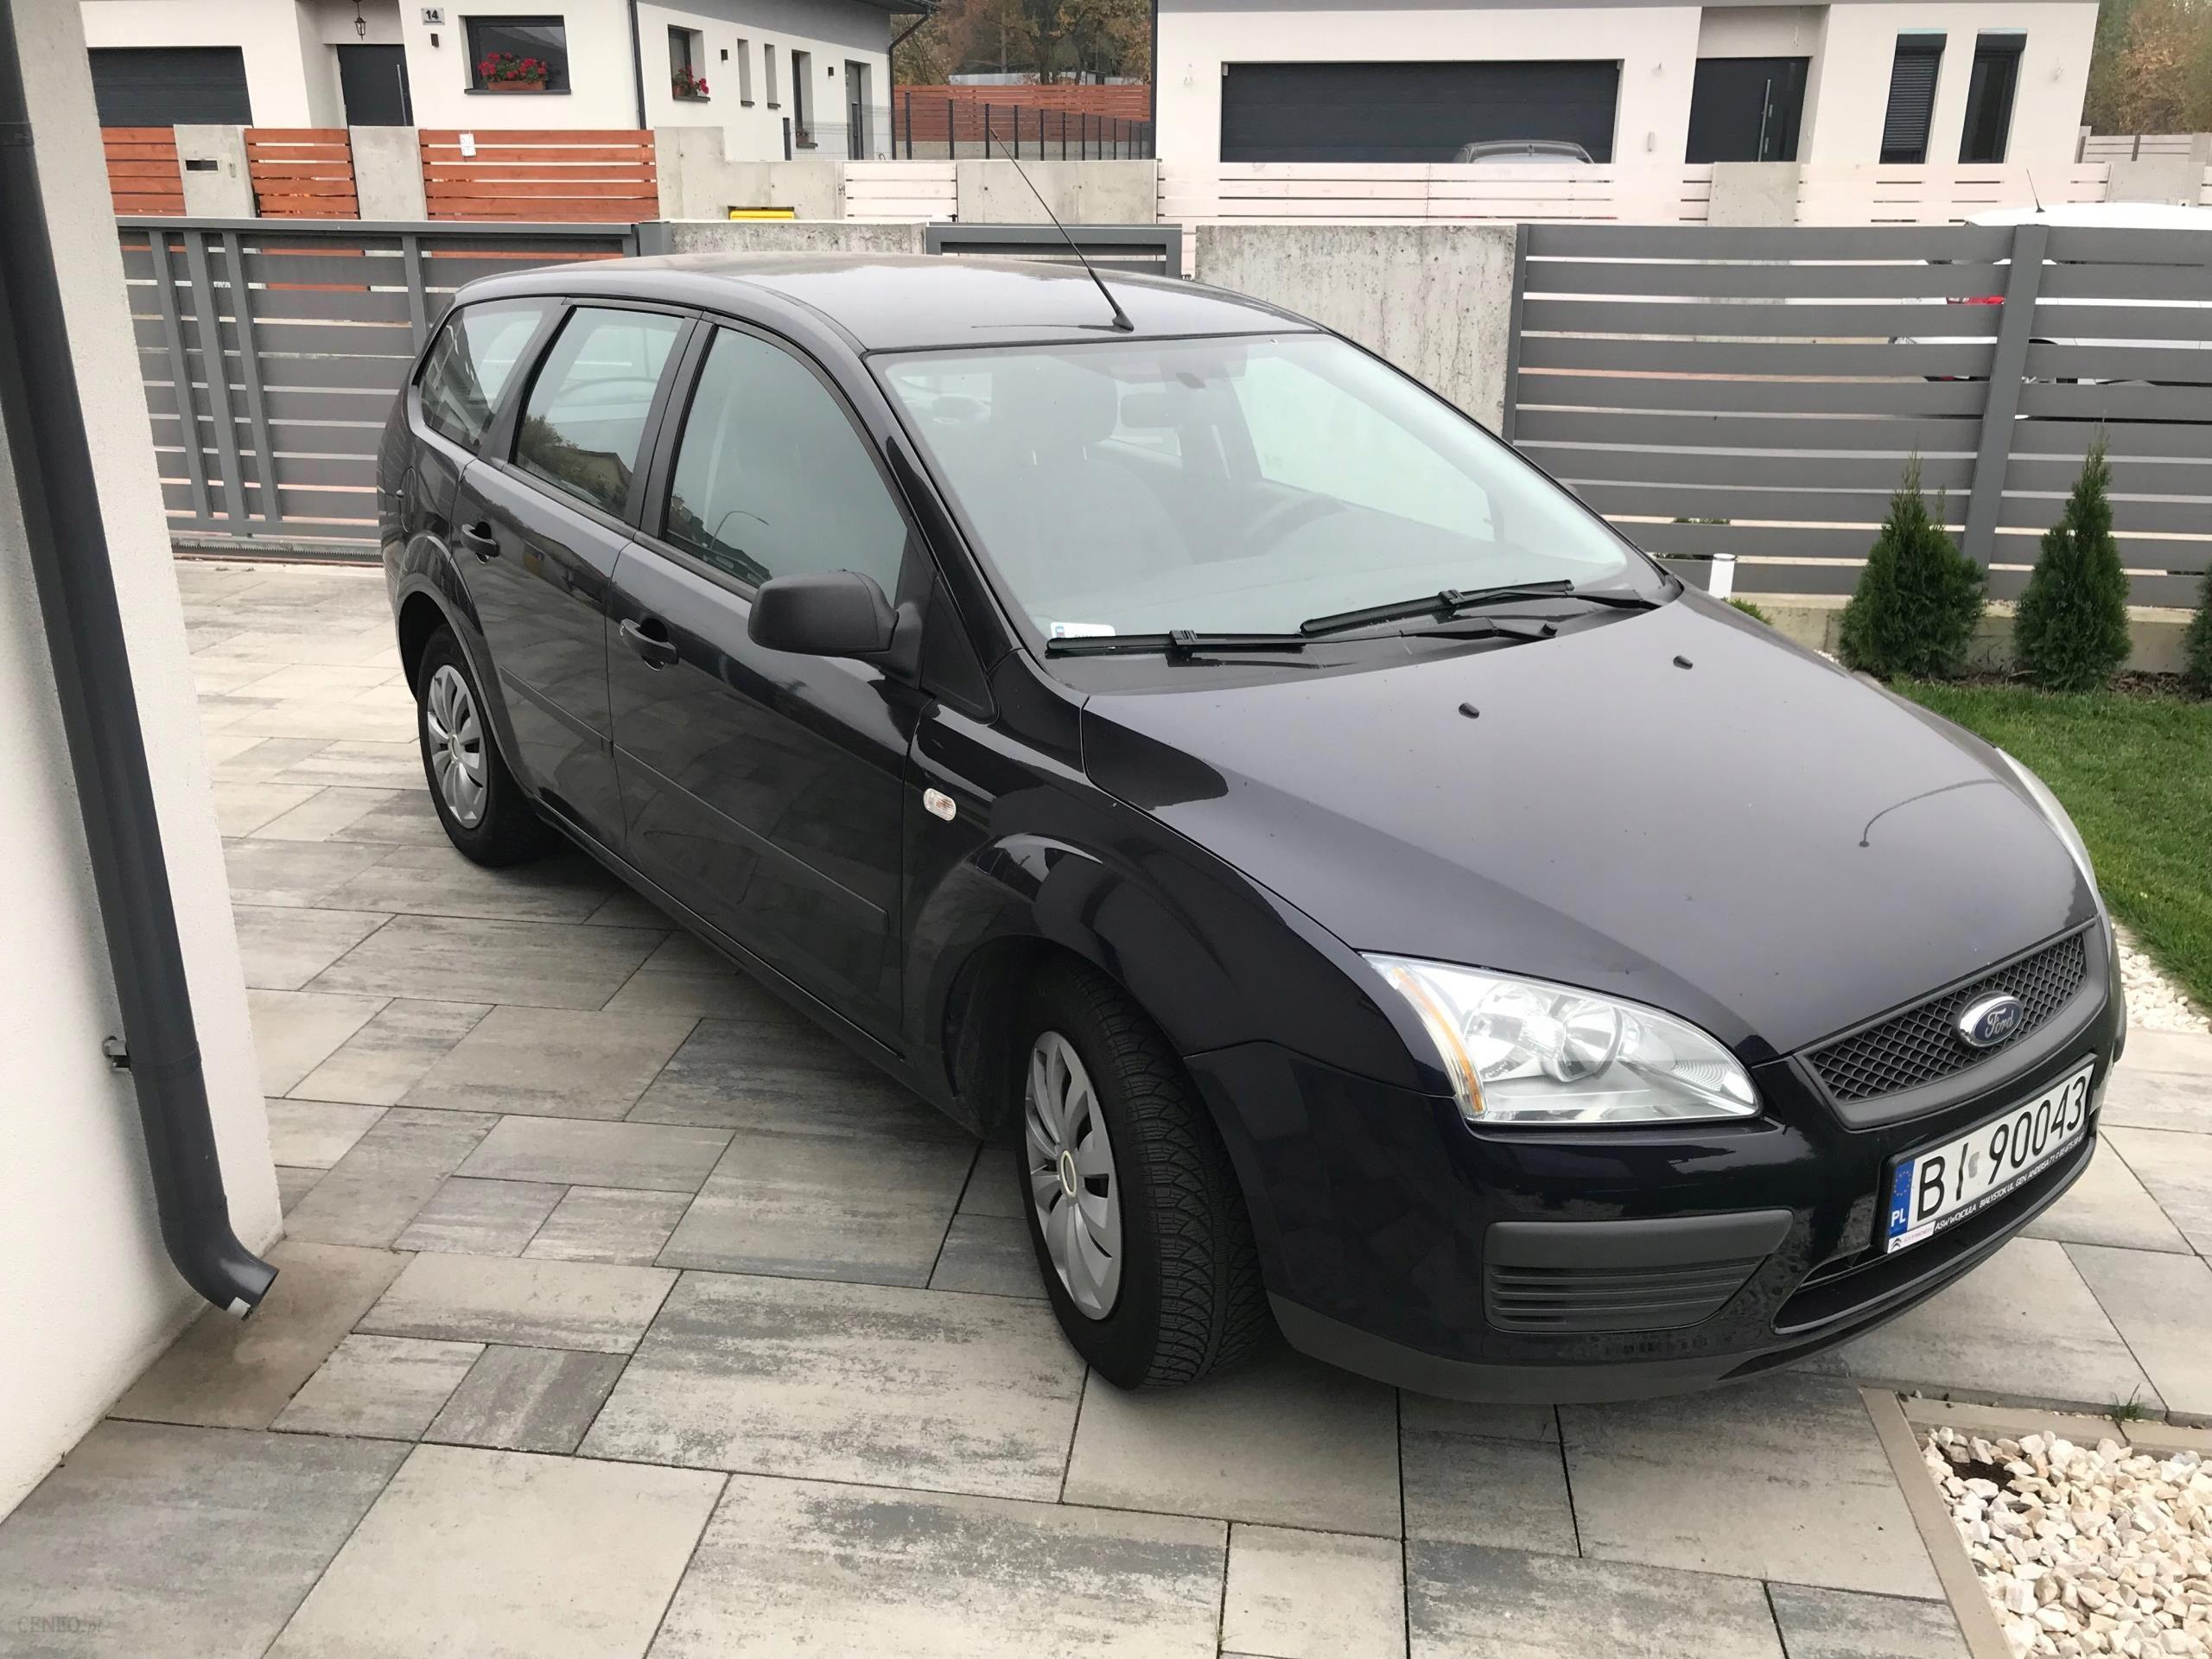 Ford Focus Mk2 Polski Salon Komplet Letnich Opon Opinie I Ceny